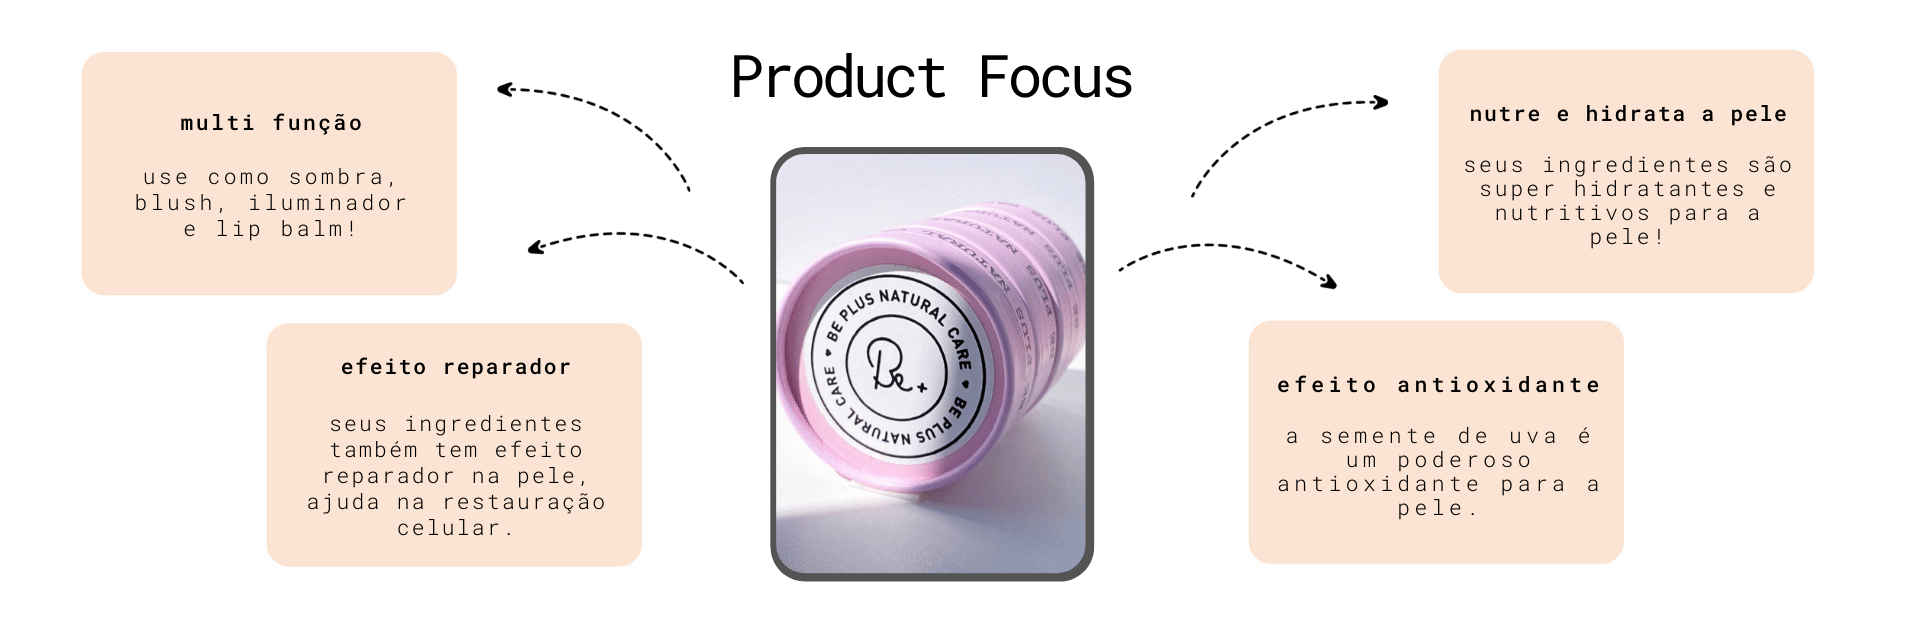 [Banner produto] muti balm 5